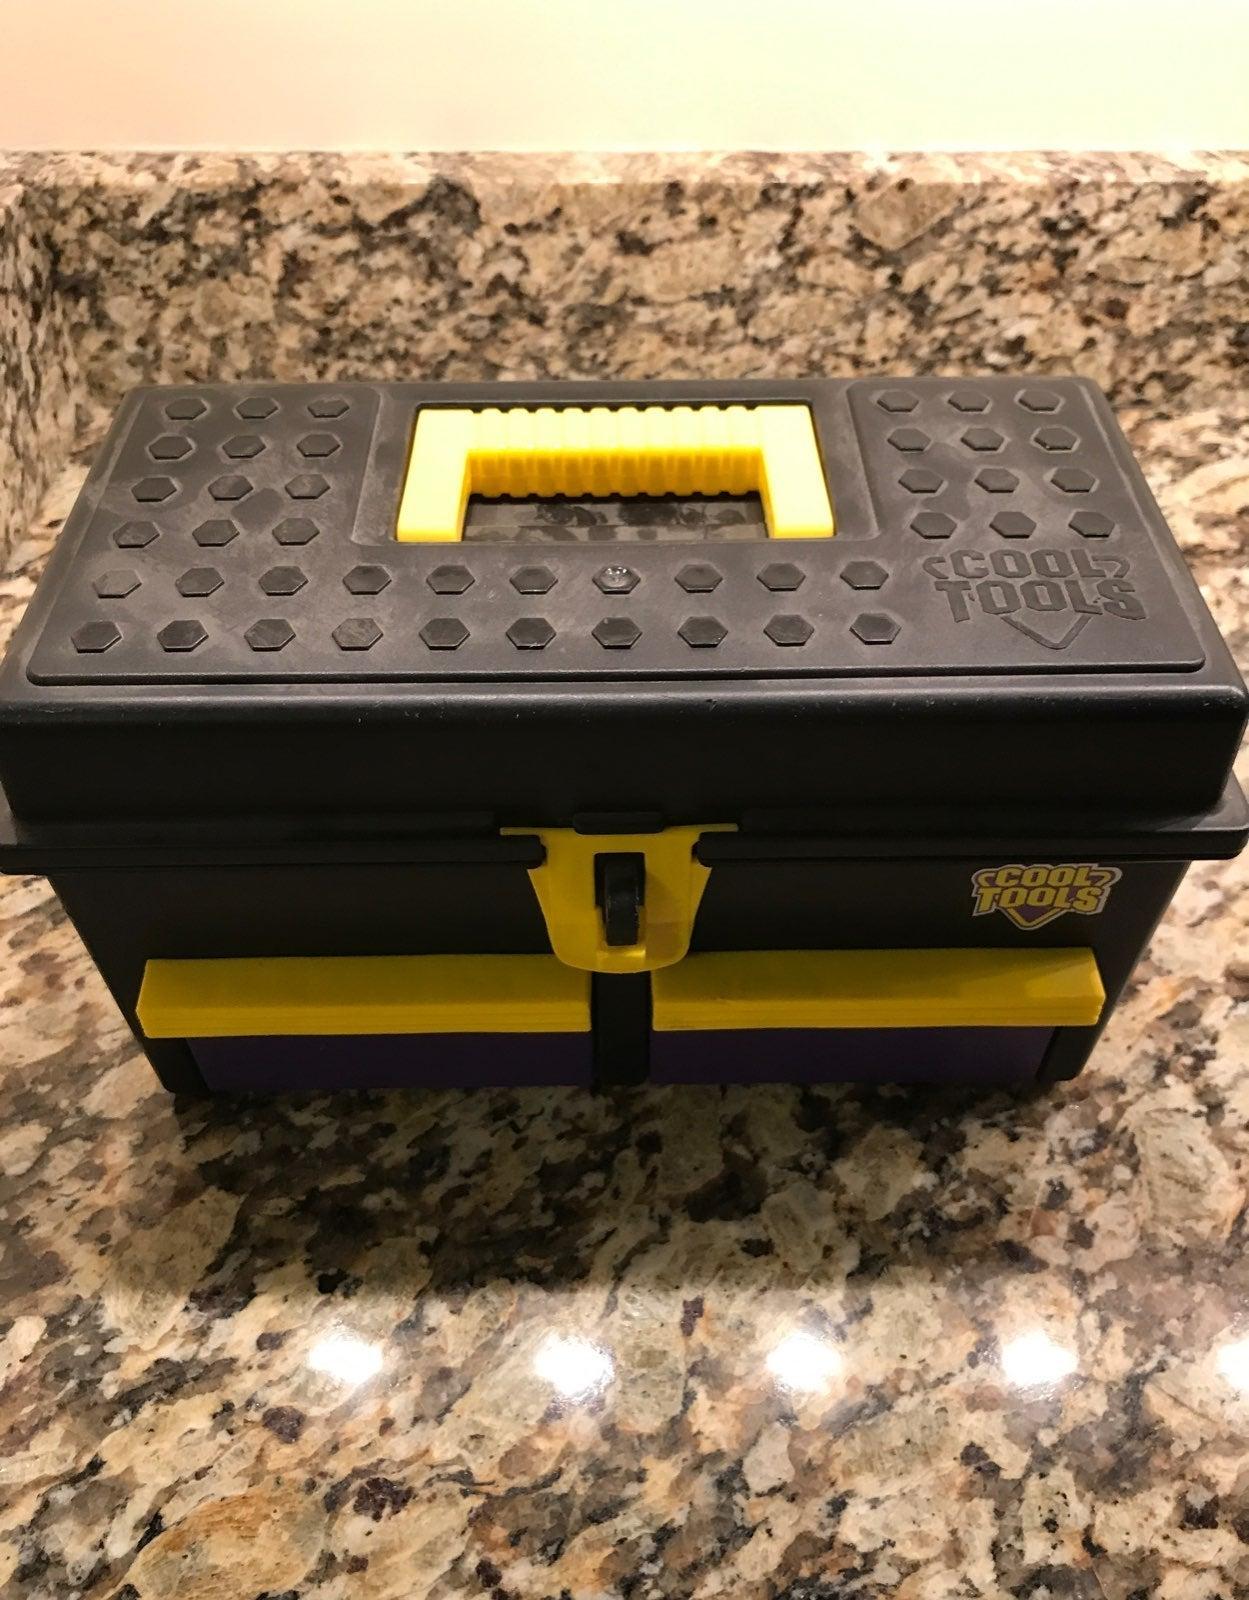 Vintage Cool Tools - Tool Box and Tools